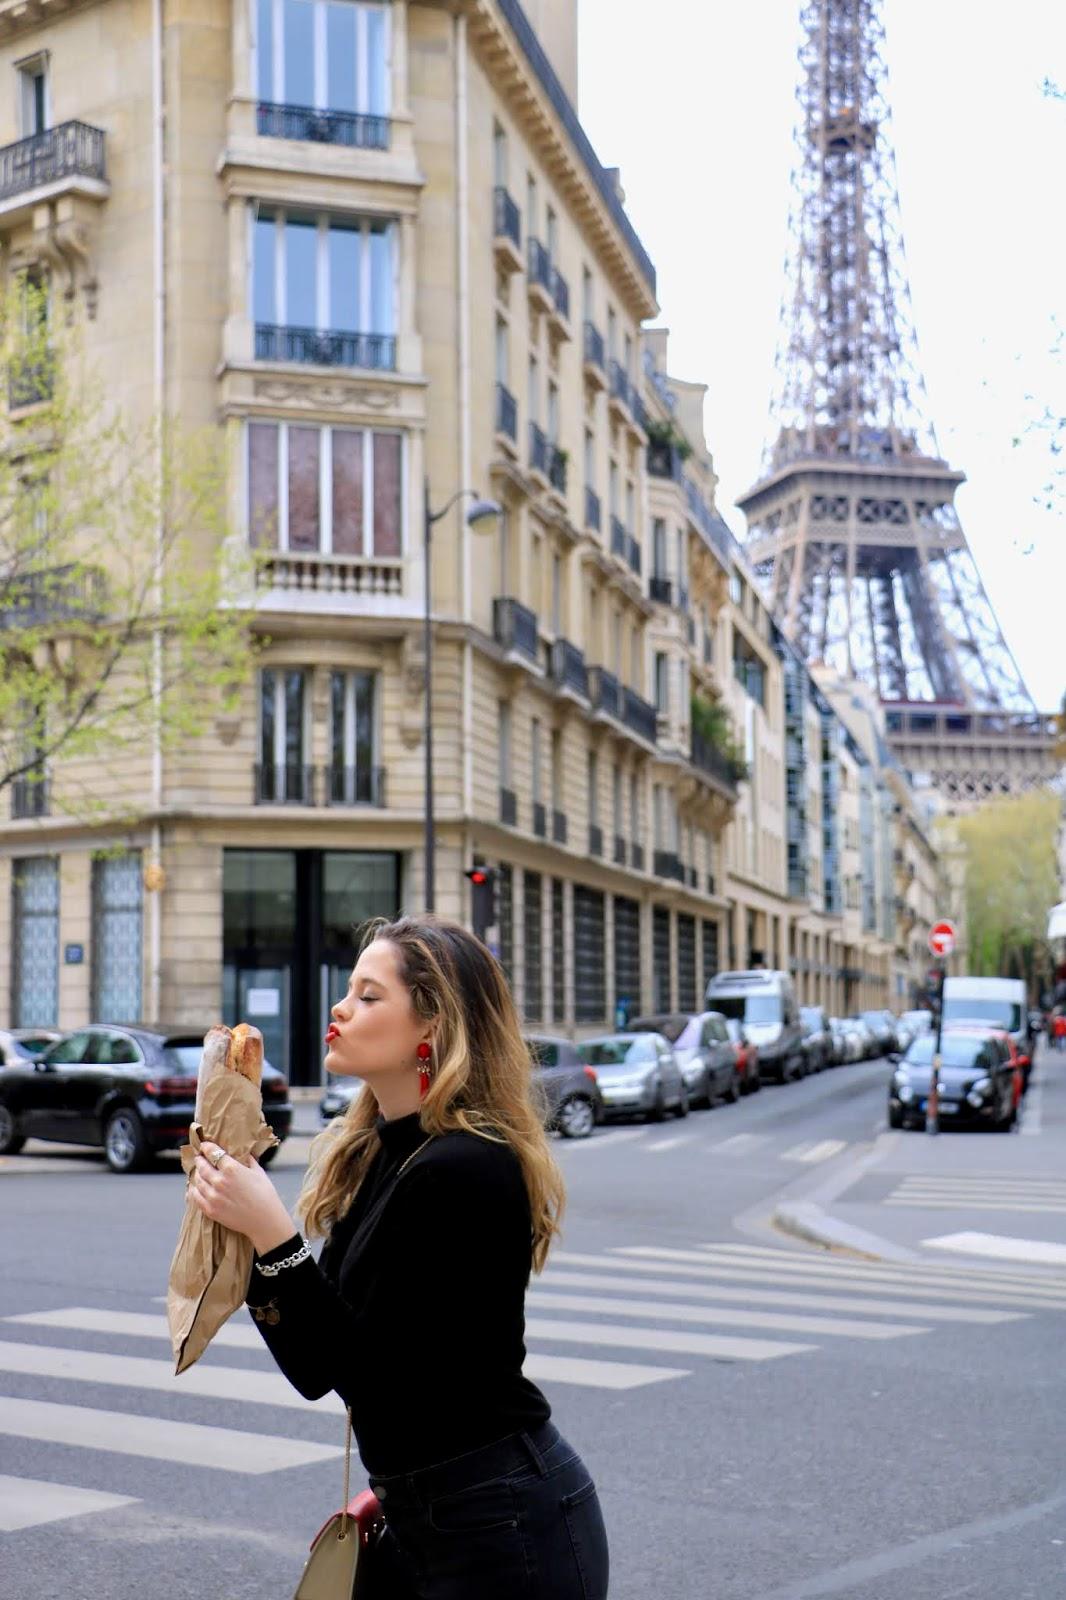 Paris long weekend ideas